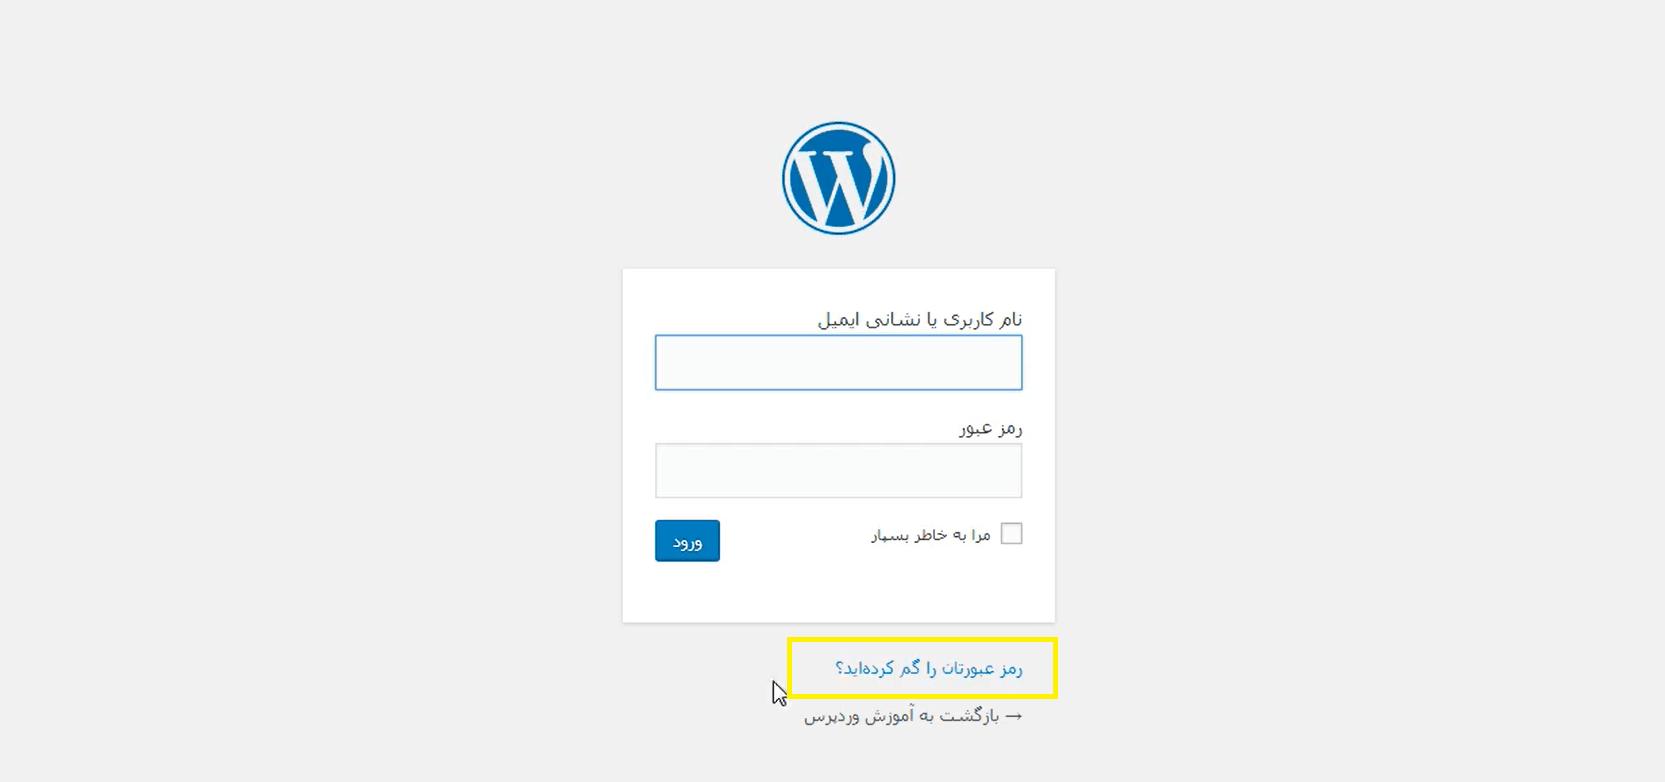 فراموشی رمز عبور وردپرس